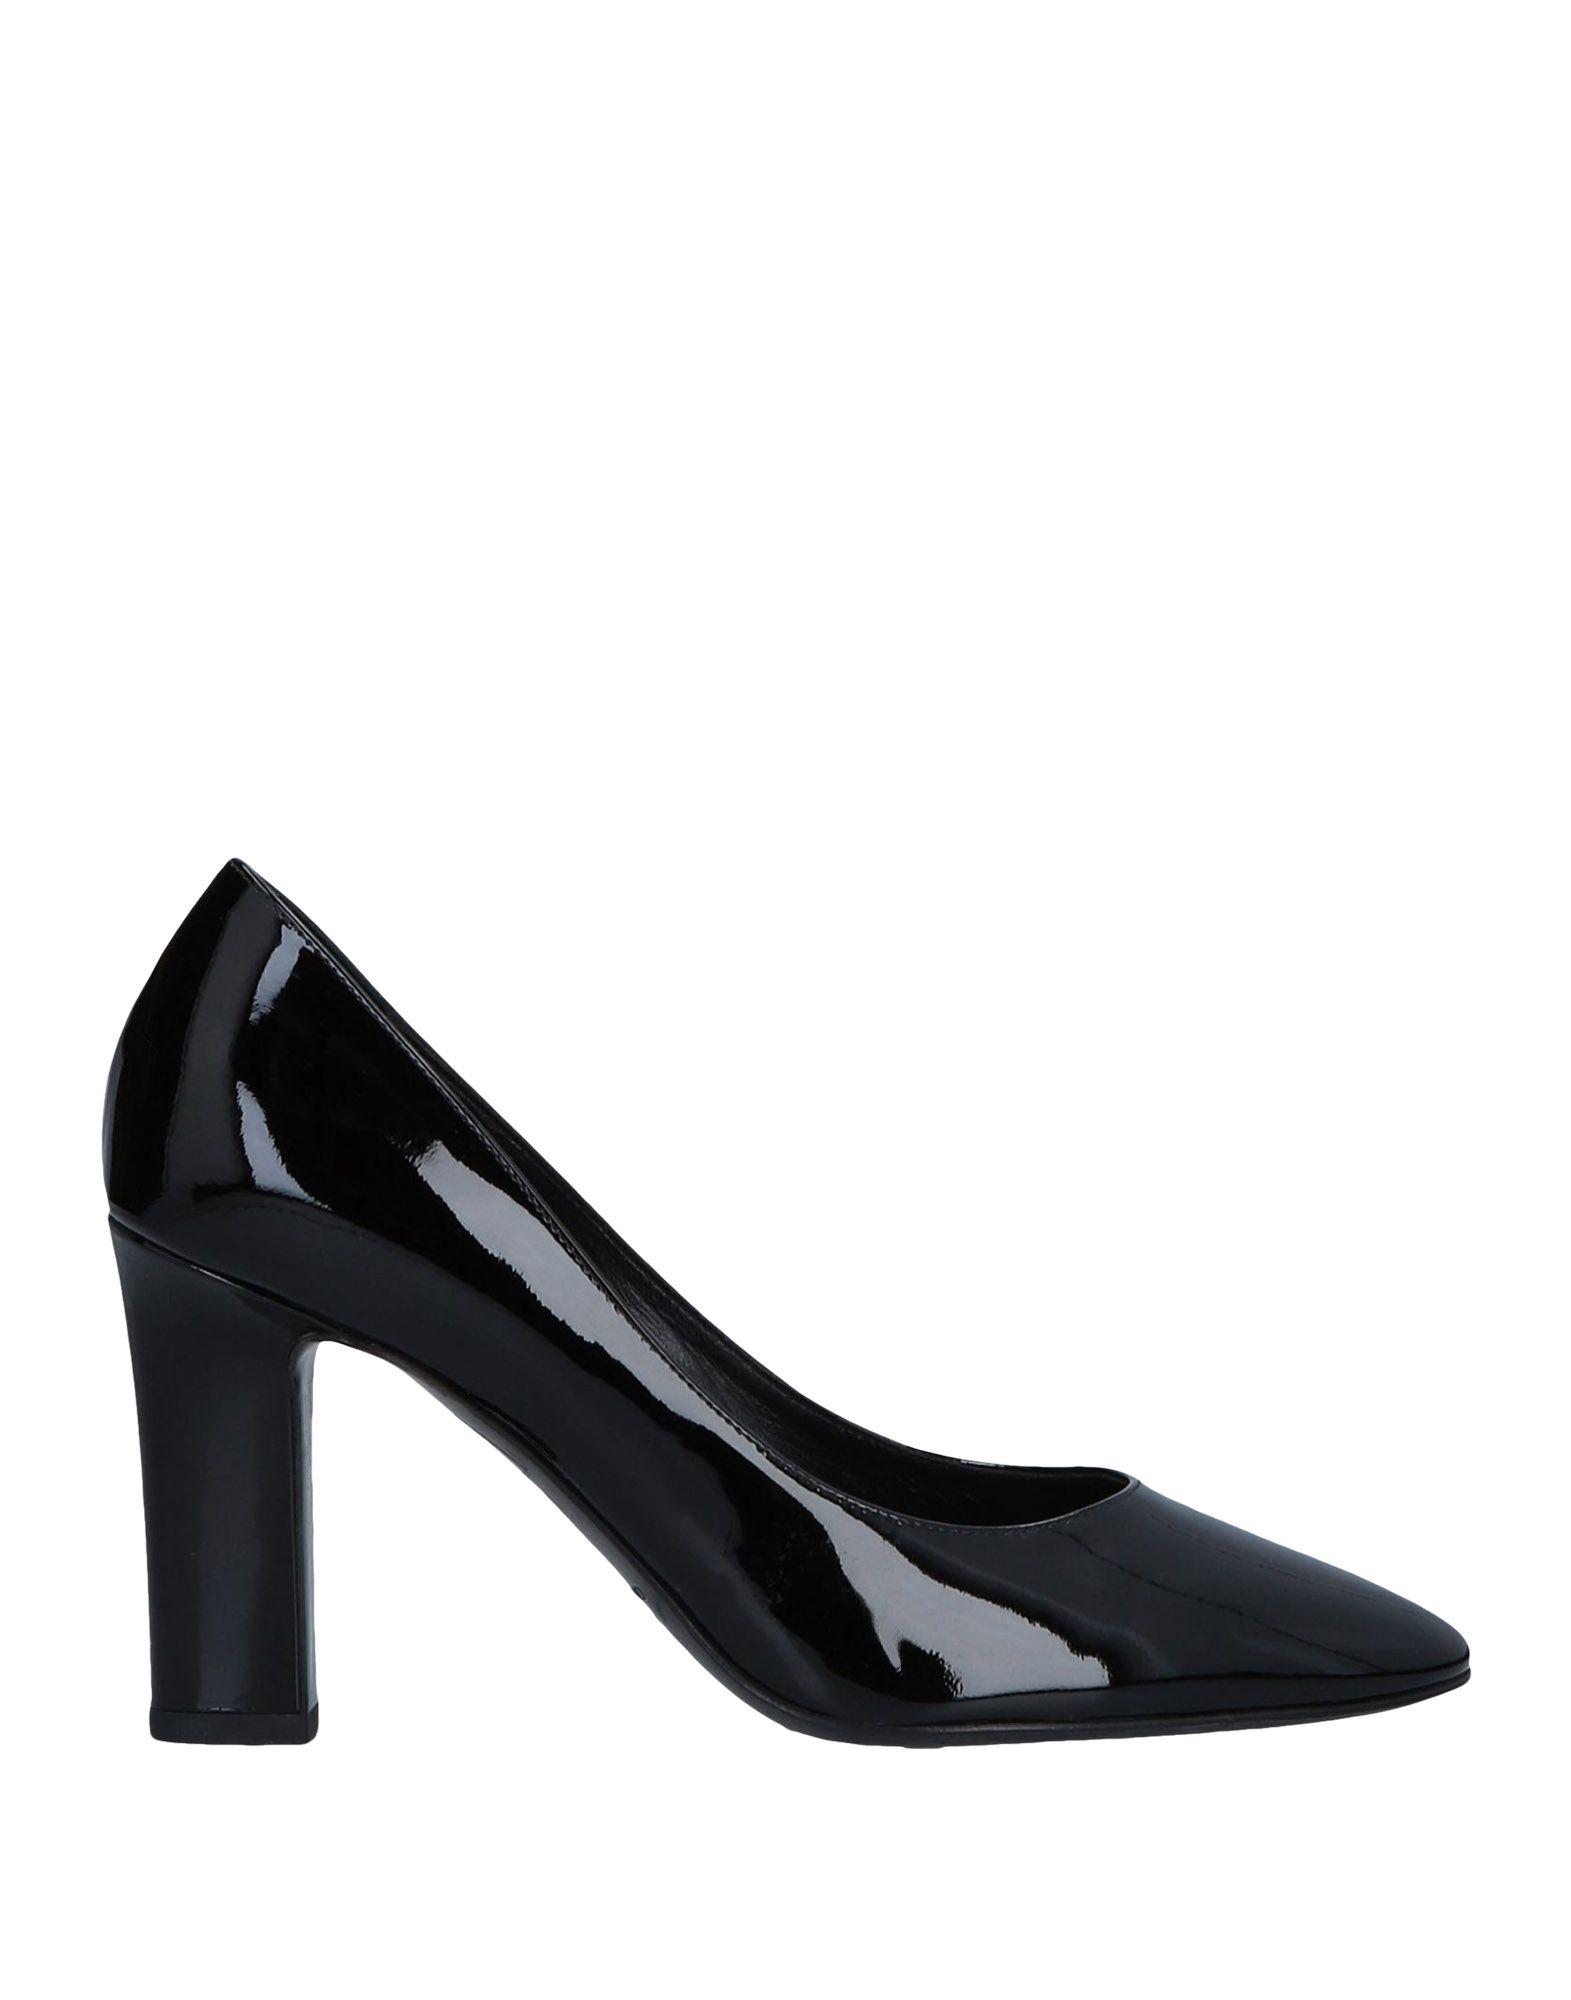 Stilvolle Pumps billige Schuhe Fratelli Karida Pumps Stilvolle Damen  11517377XU 39ca51